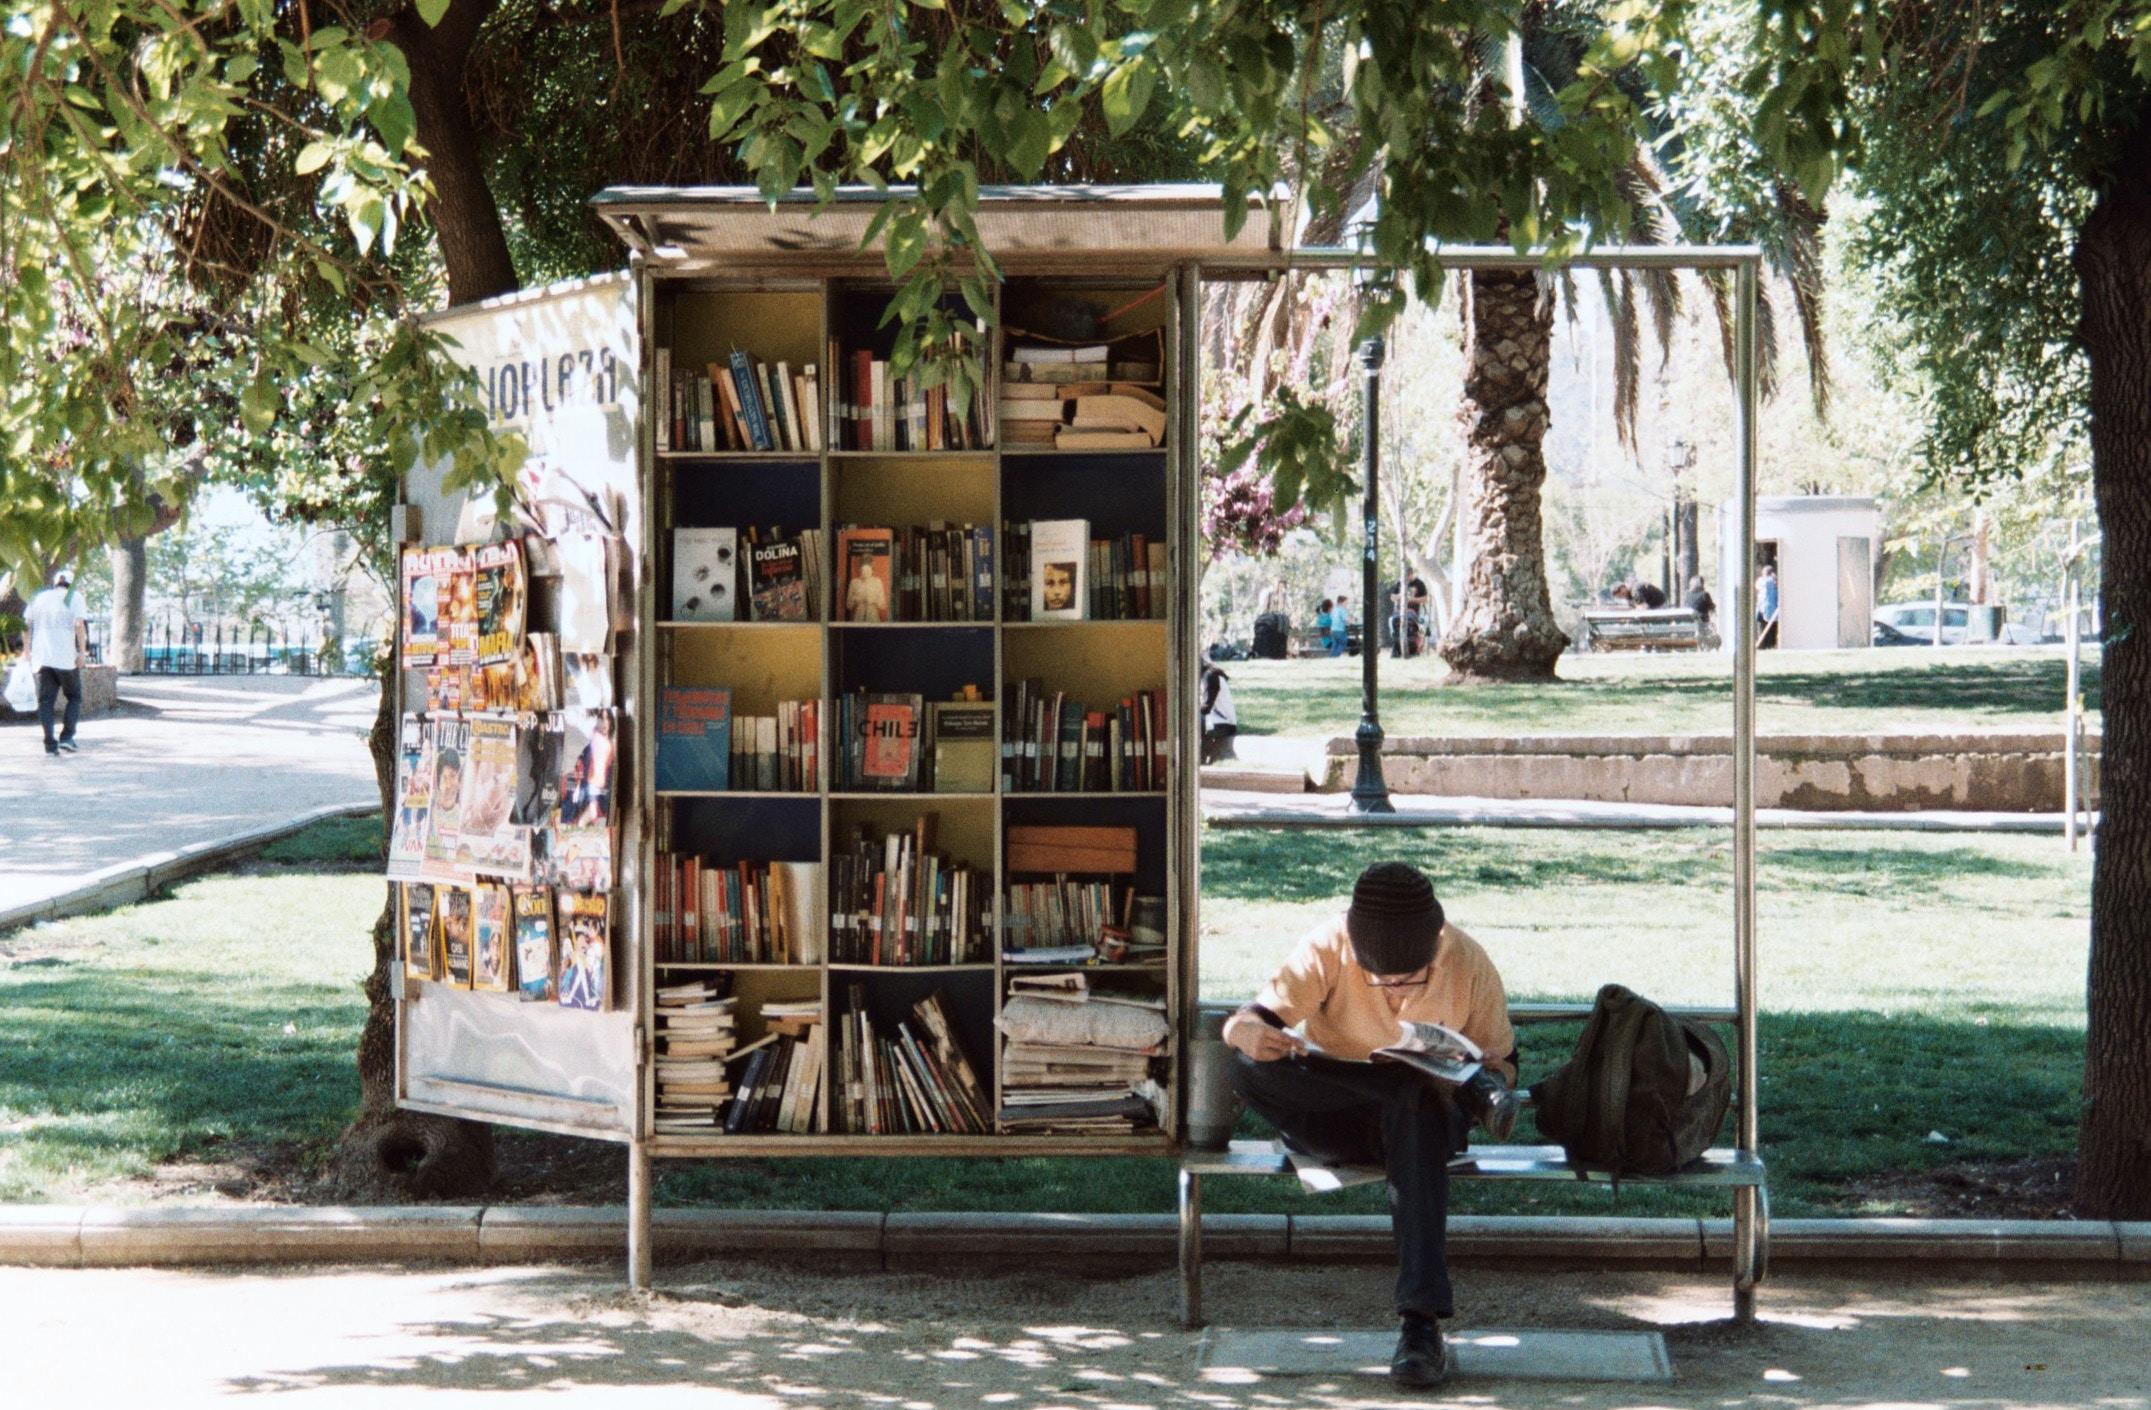 boy sitting on bench beside bookshelf